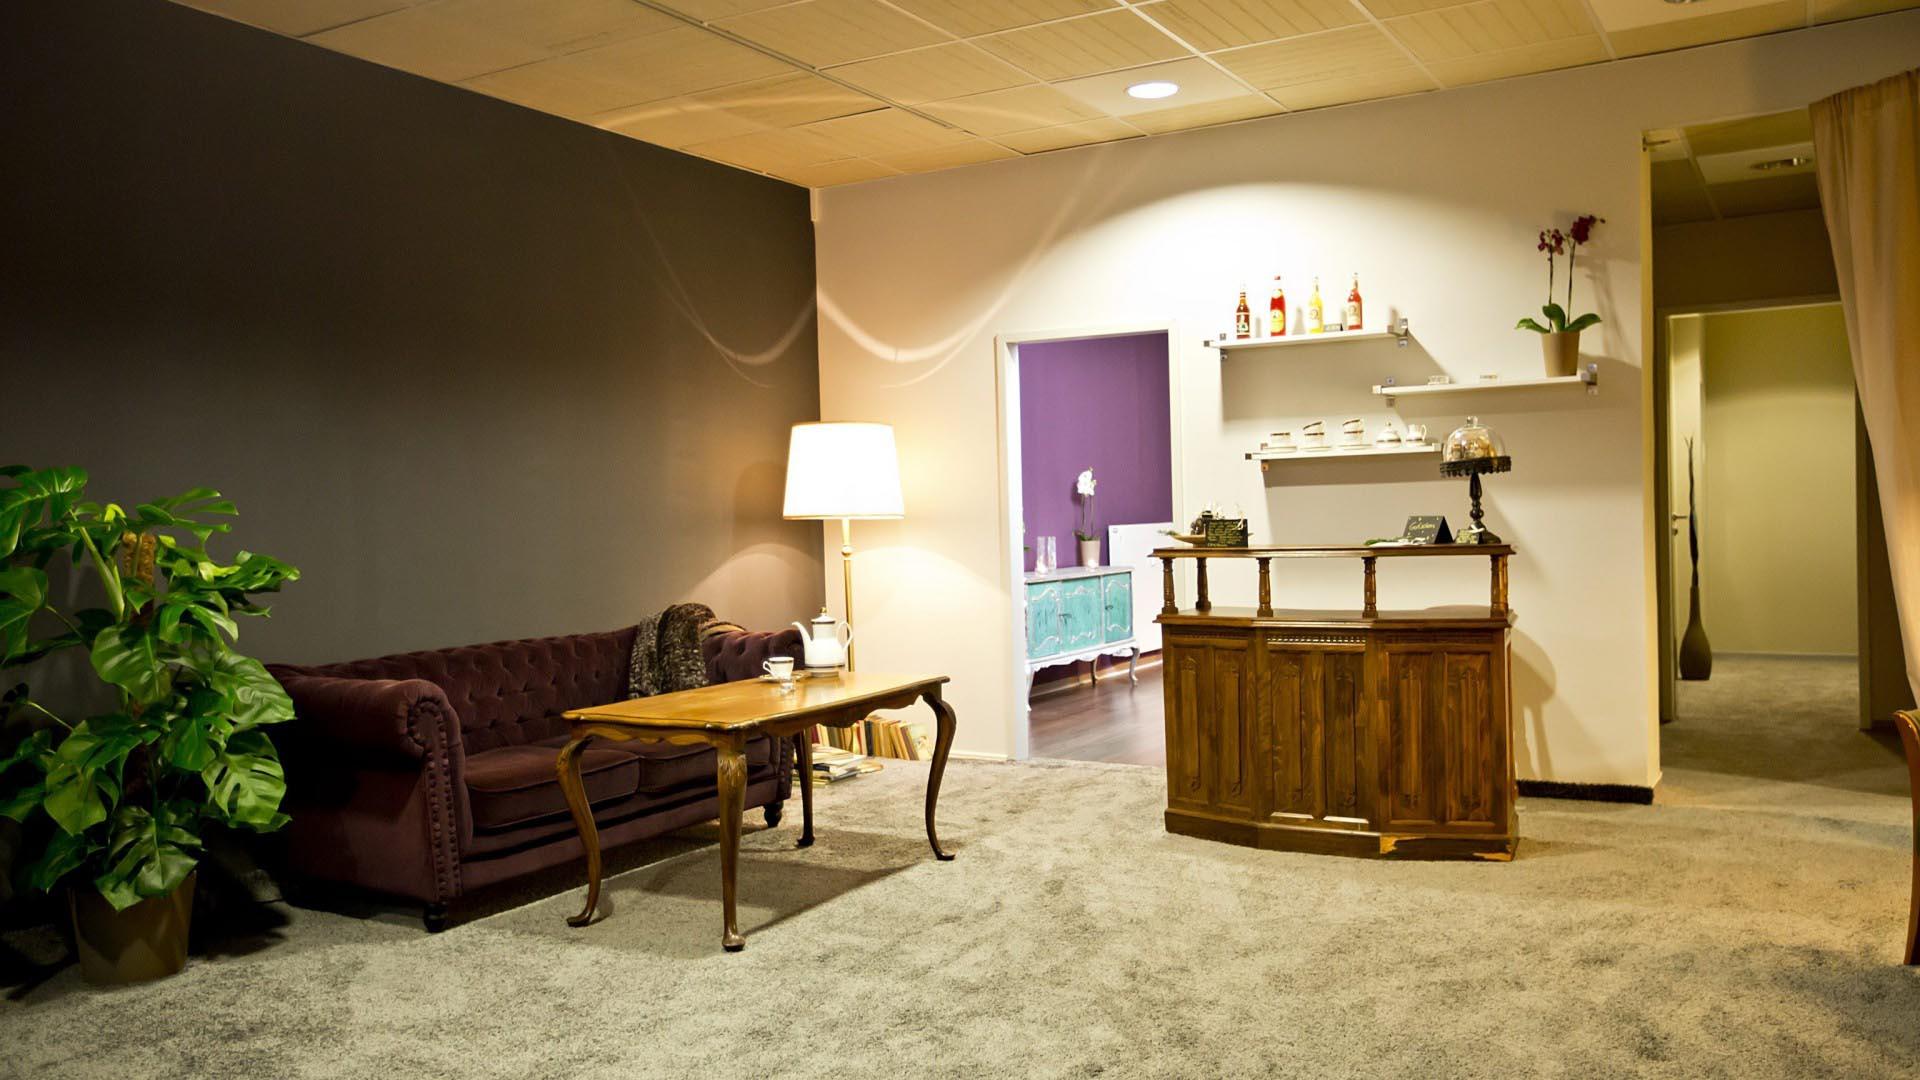 Powernap-Studio in Germany rest room 2